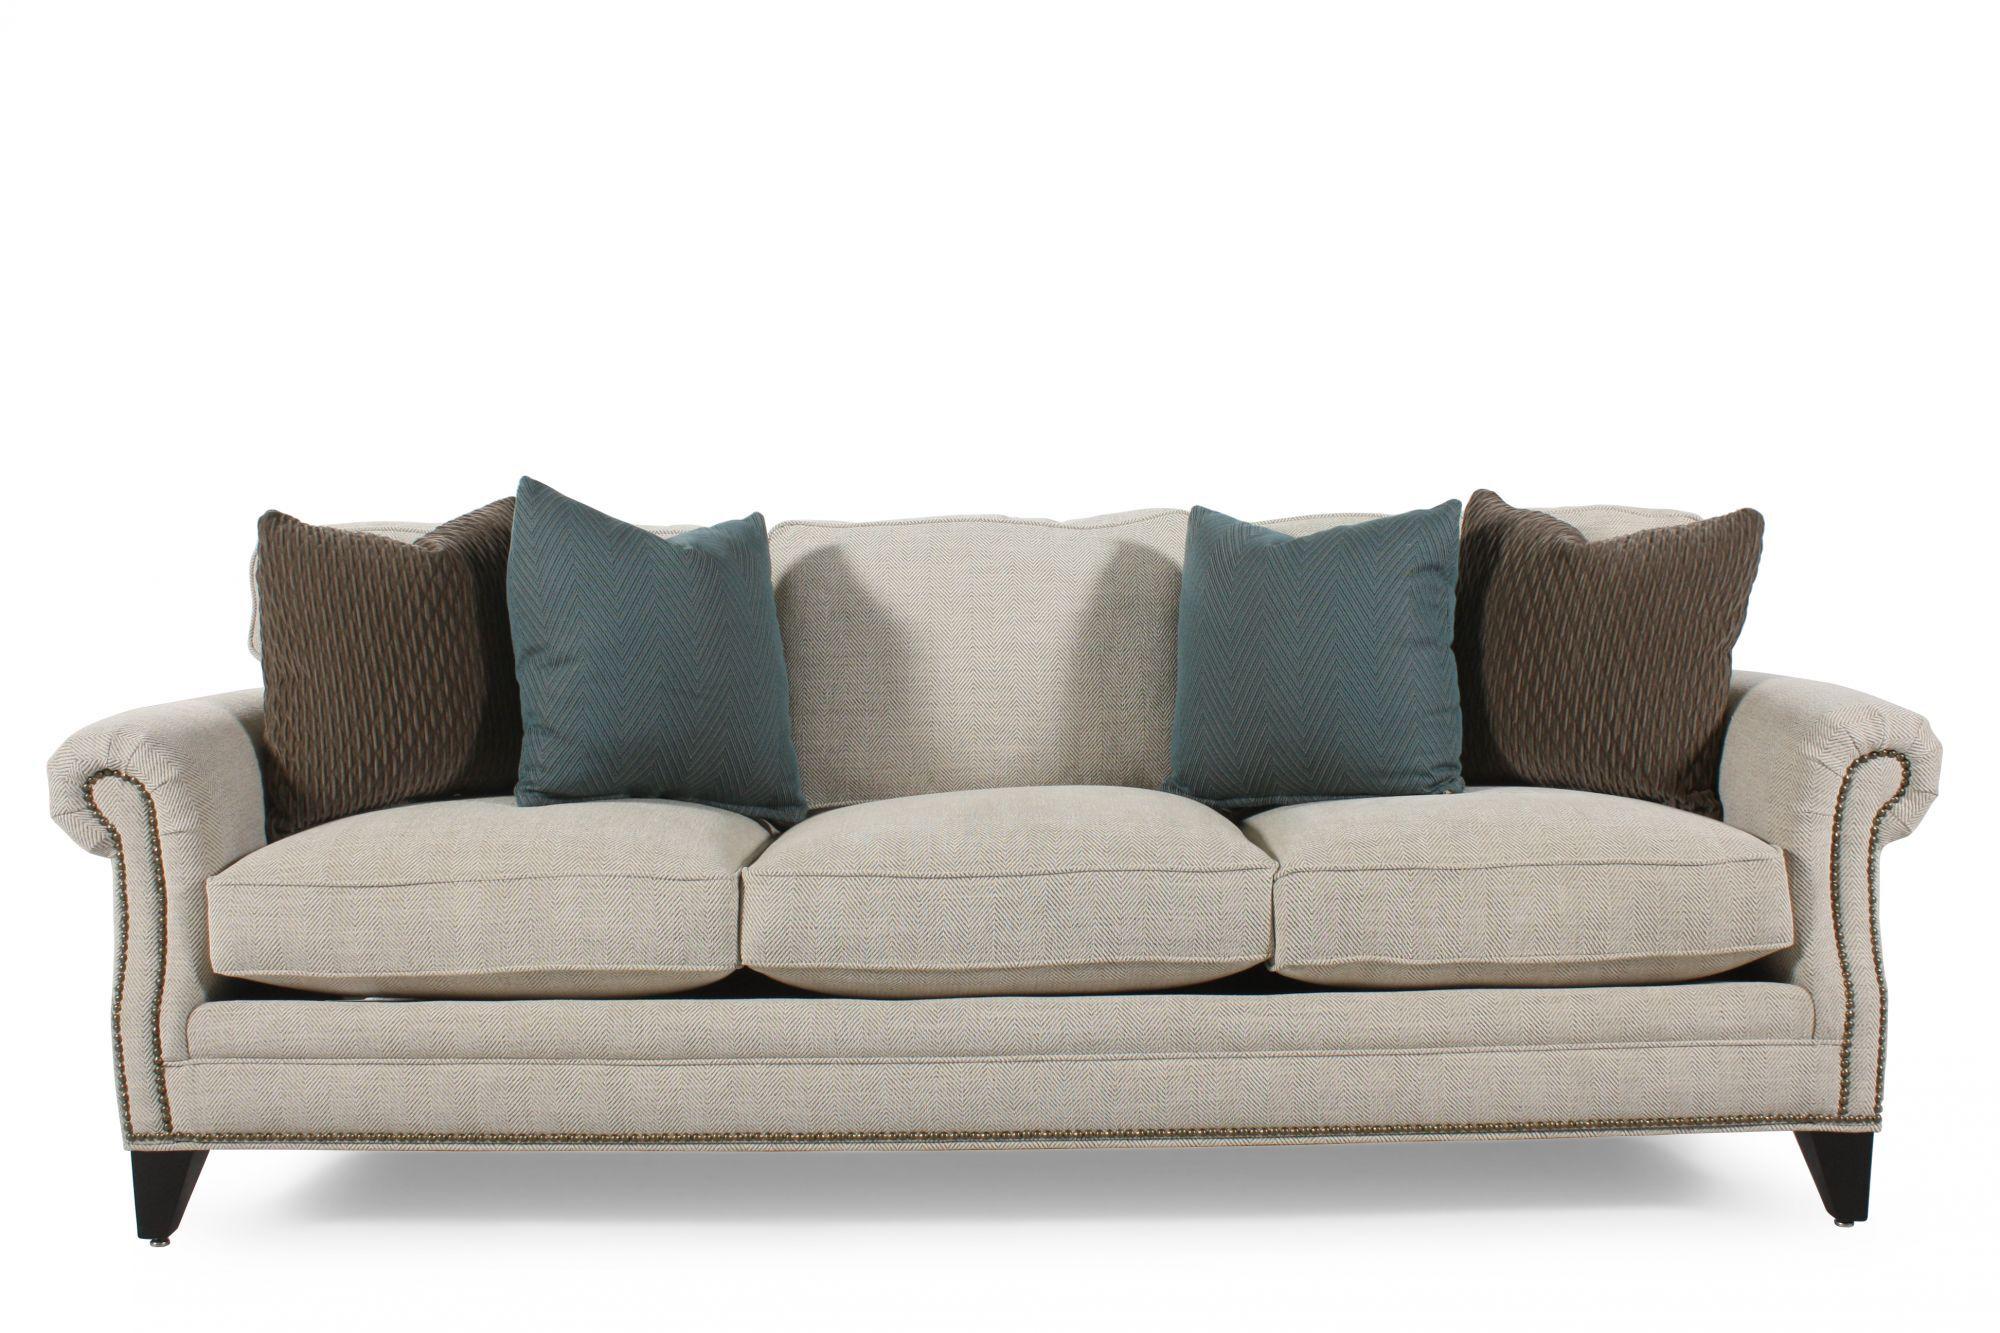 jonathan louis sofas master foam sofa set caitlyn mathis brothers furniture